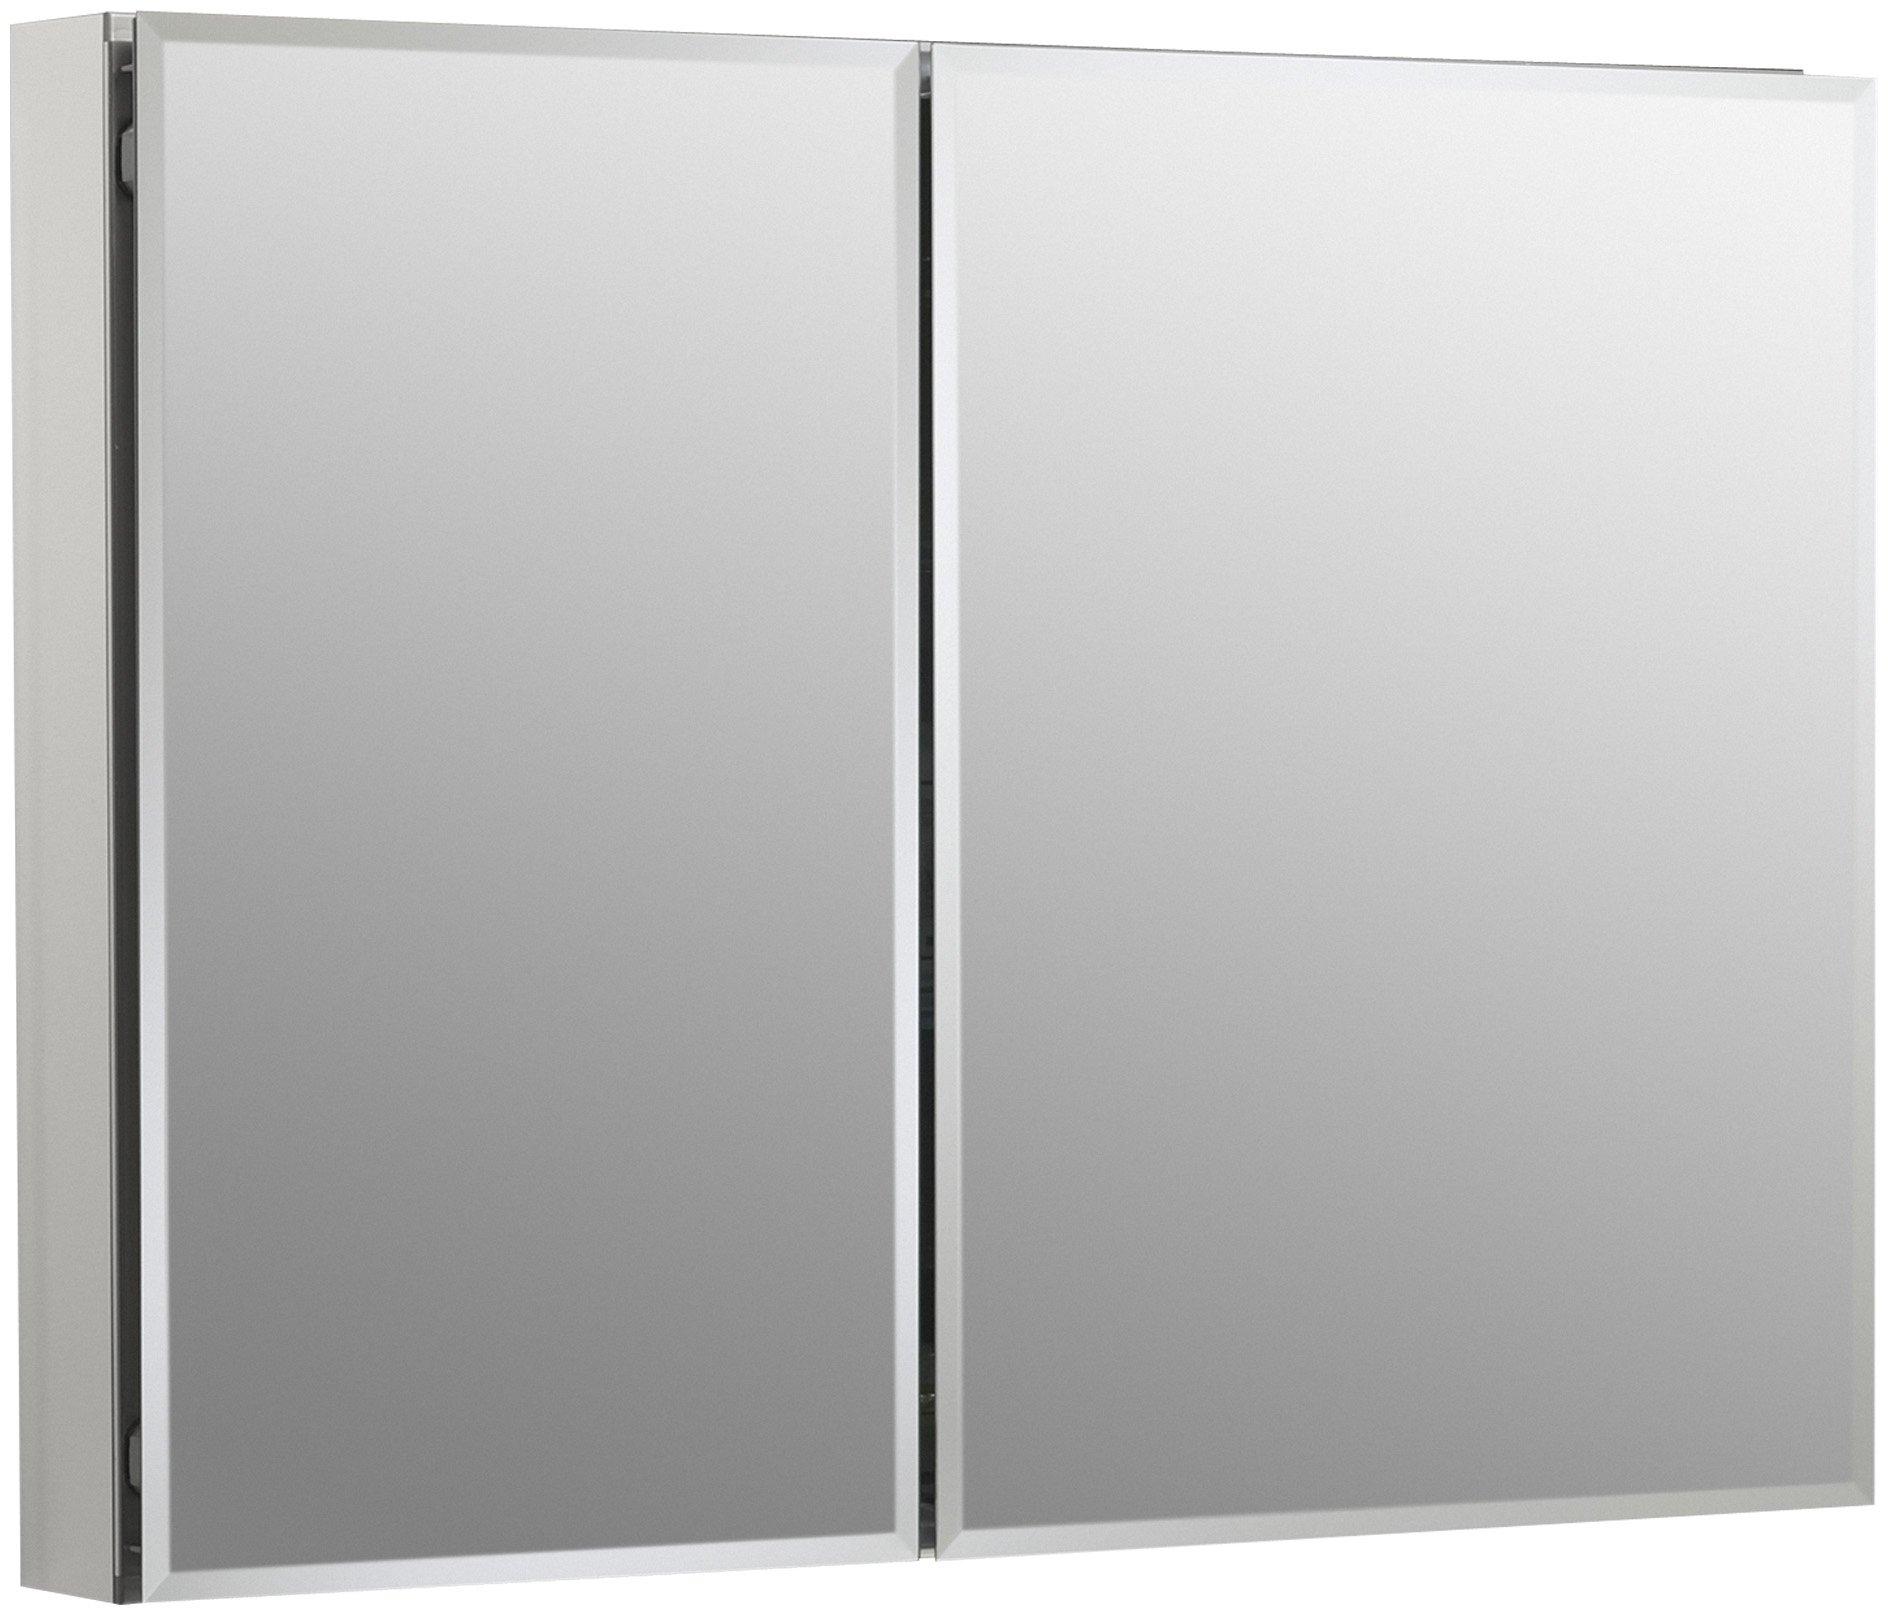 KOHLER K-CB-CLC3526FS 35-by-26-by-5-Inch Double Door Aluminum Cabinet